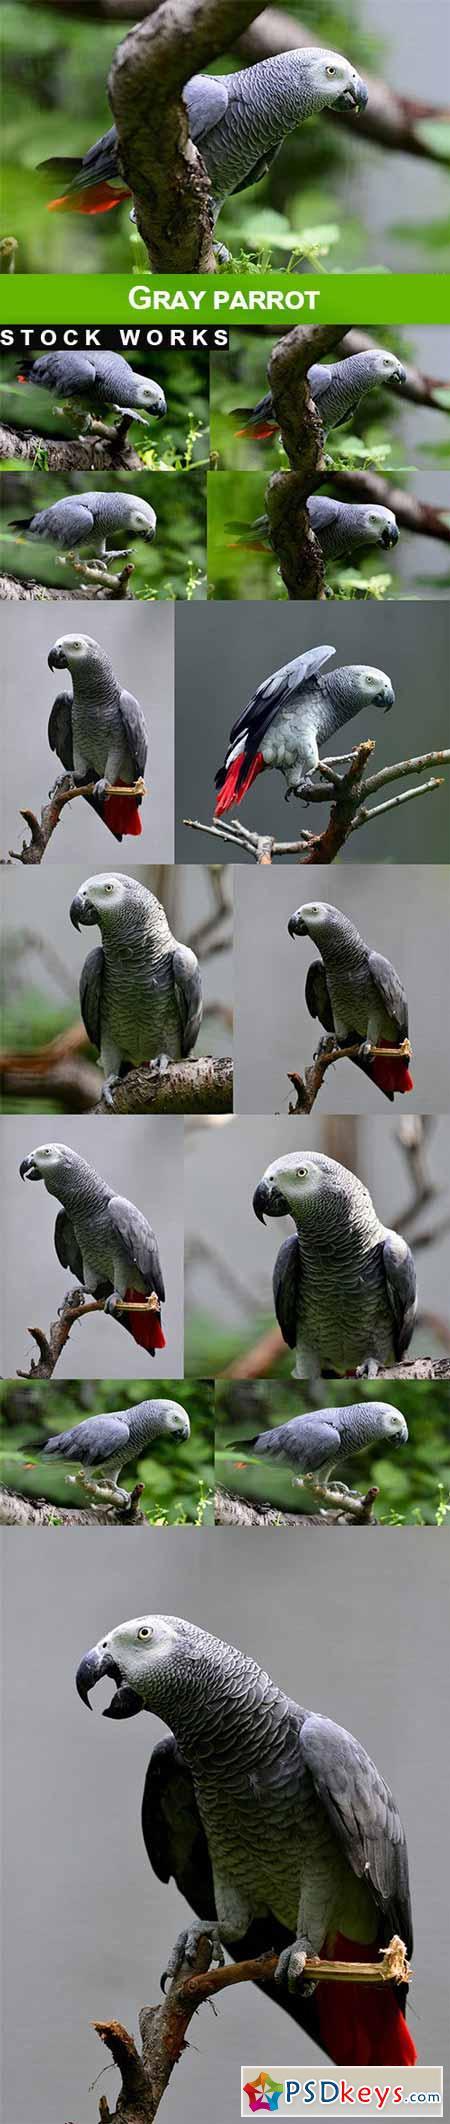 Gray Parrot - 13 UHQ JPEG